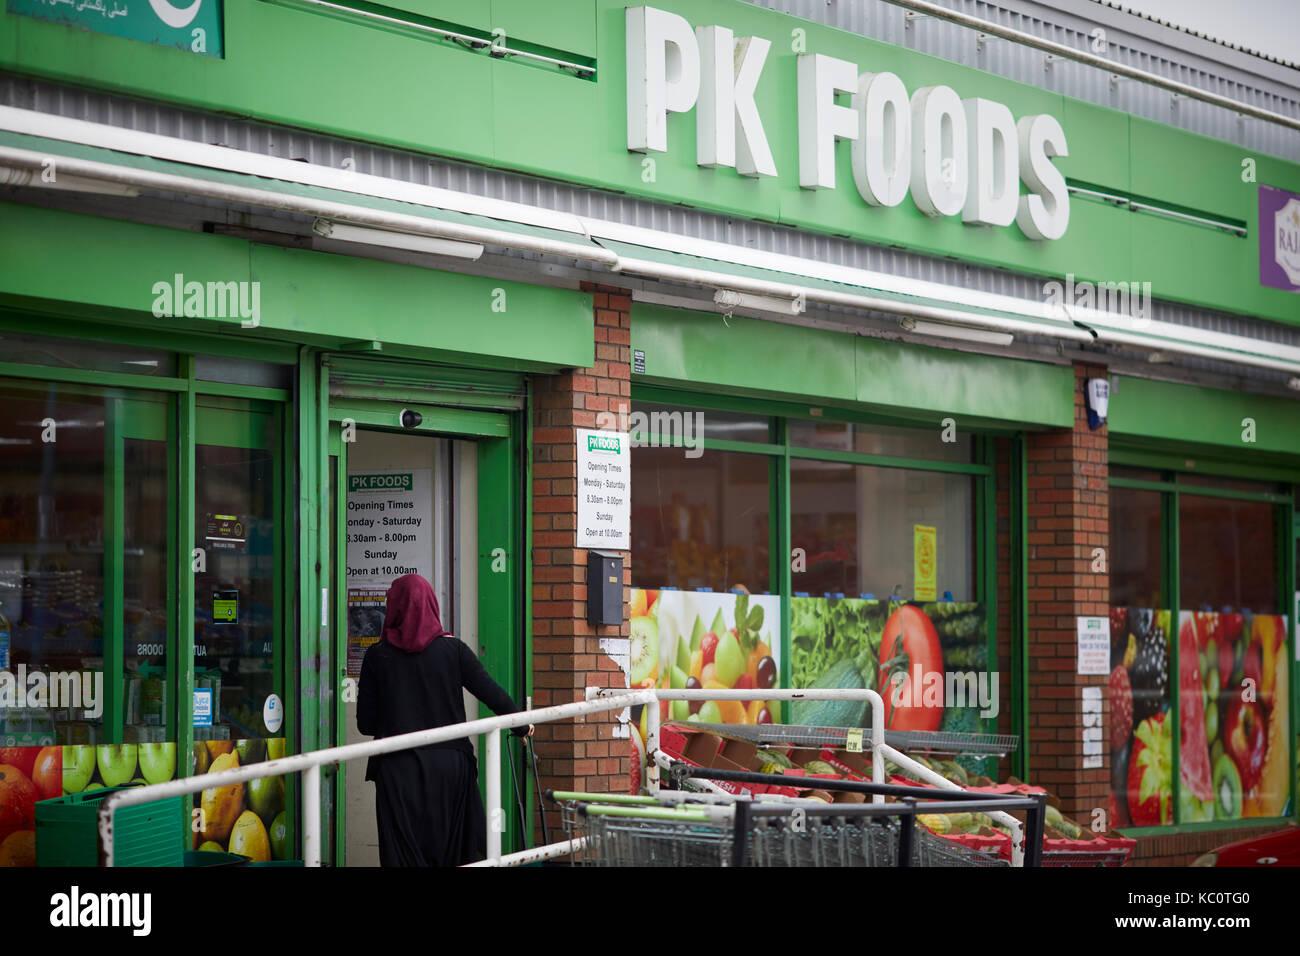 PK Foods supermarket in Bolton on Blackburn Road - Stock Image